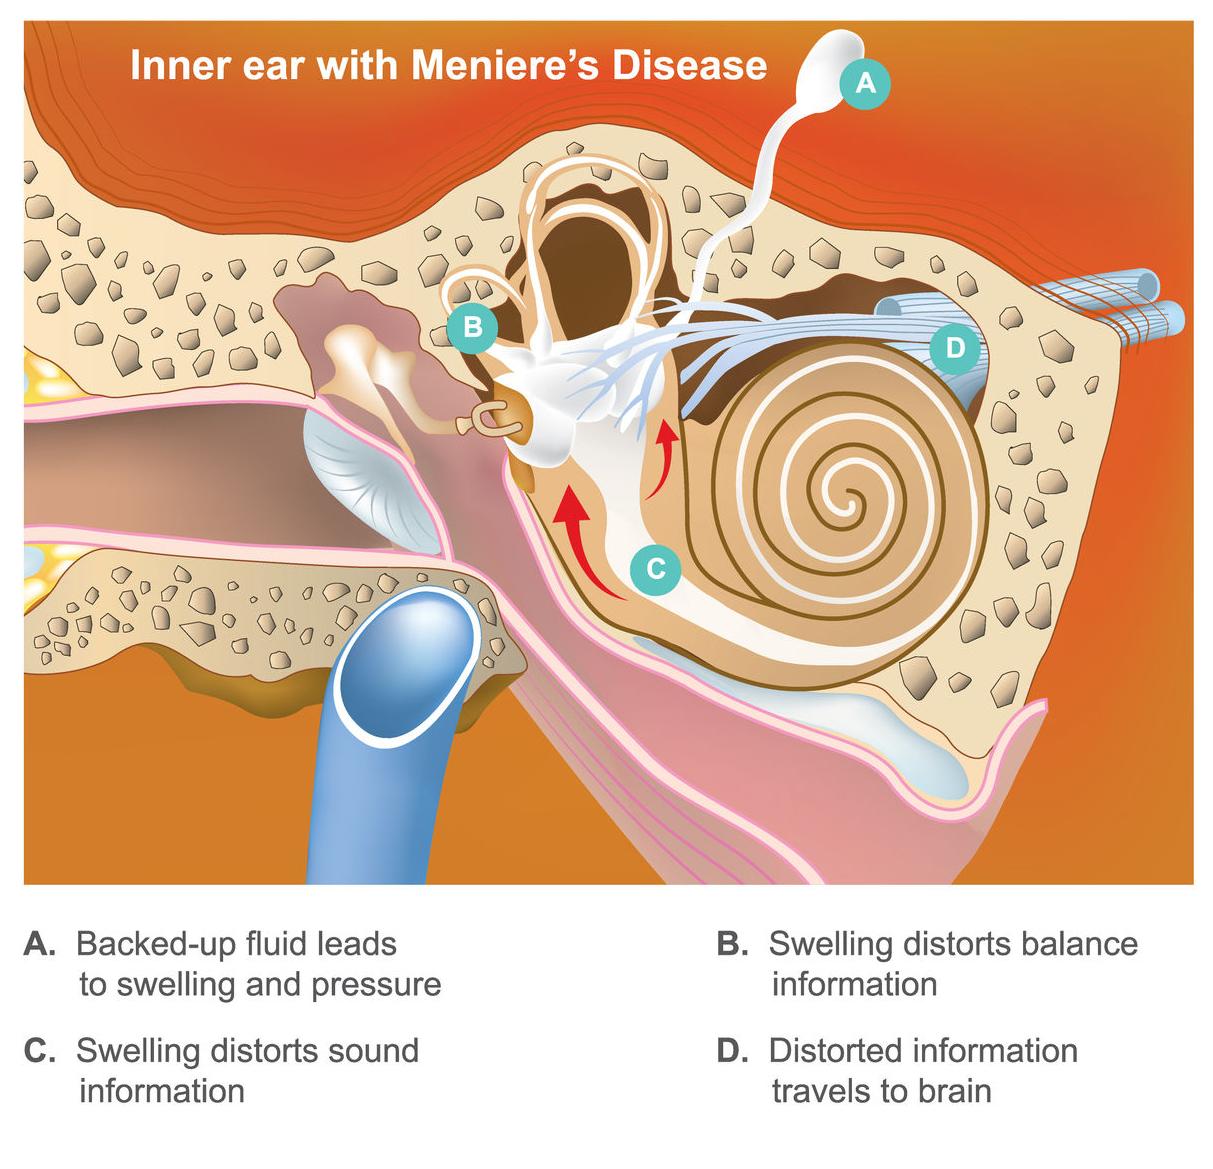 Difference Between Benign Paroxysmal Positional Vertigo (BPPV) and Meniere's Disease